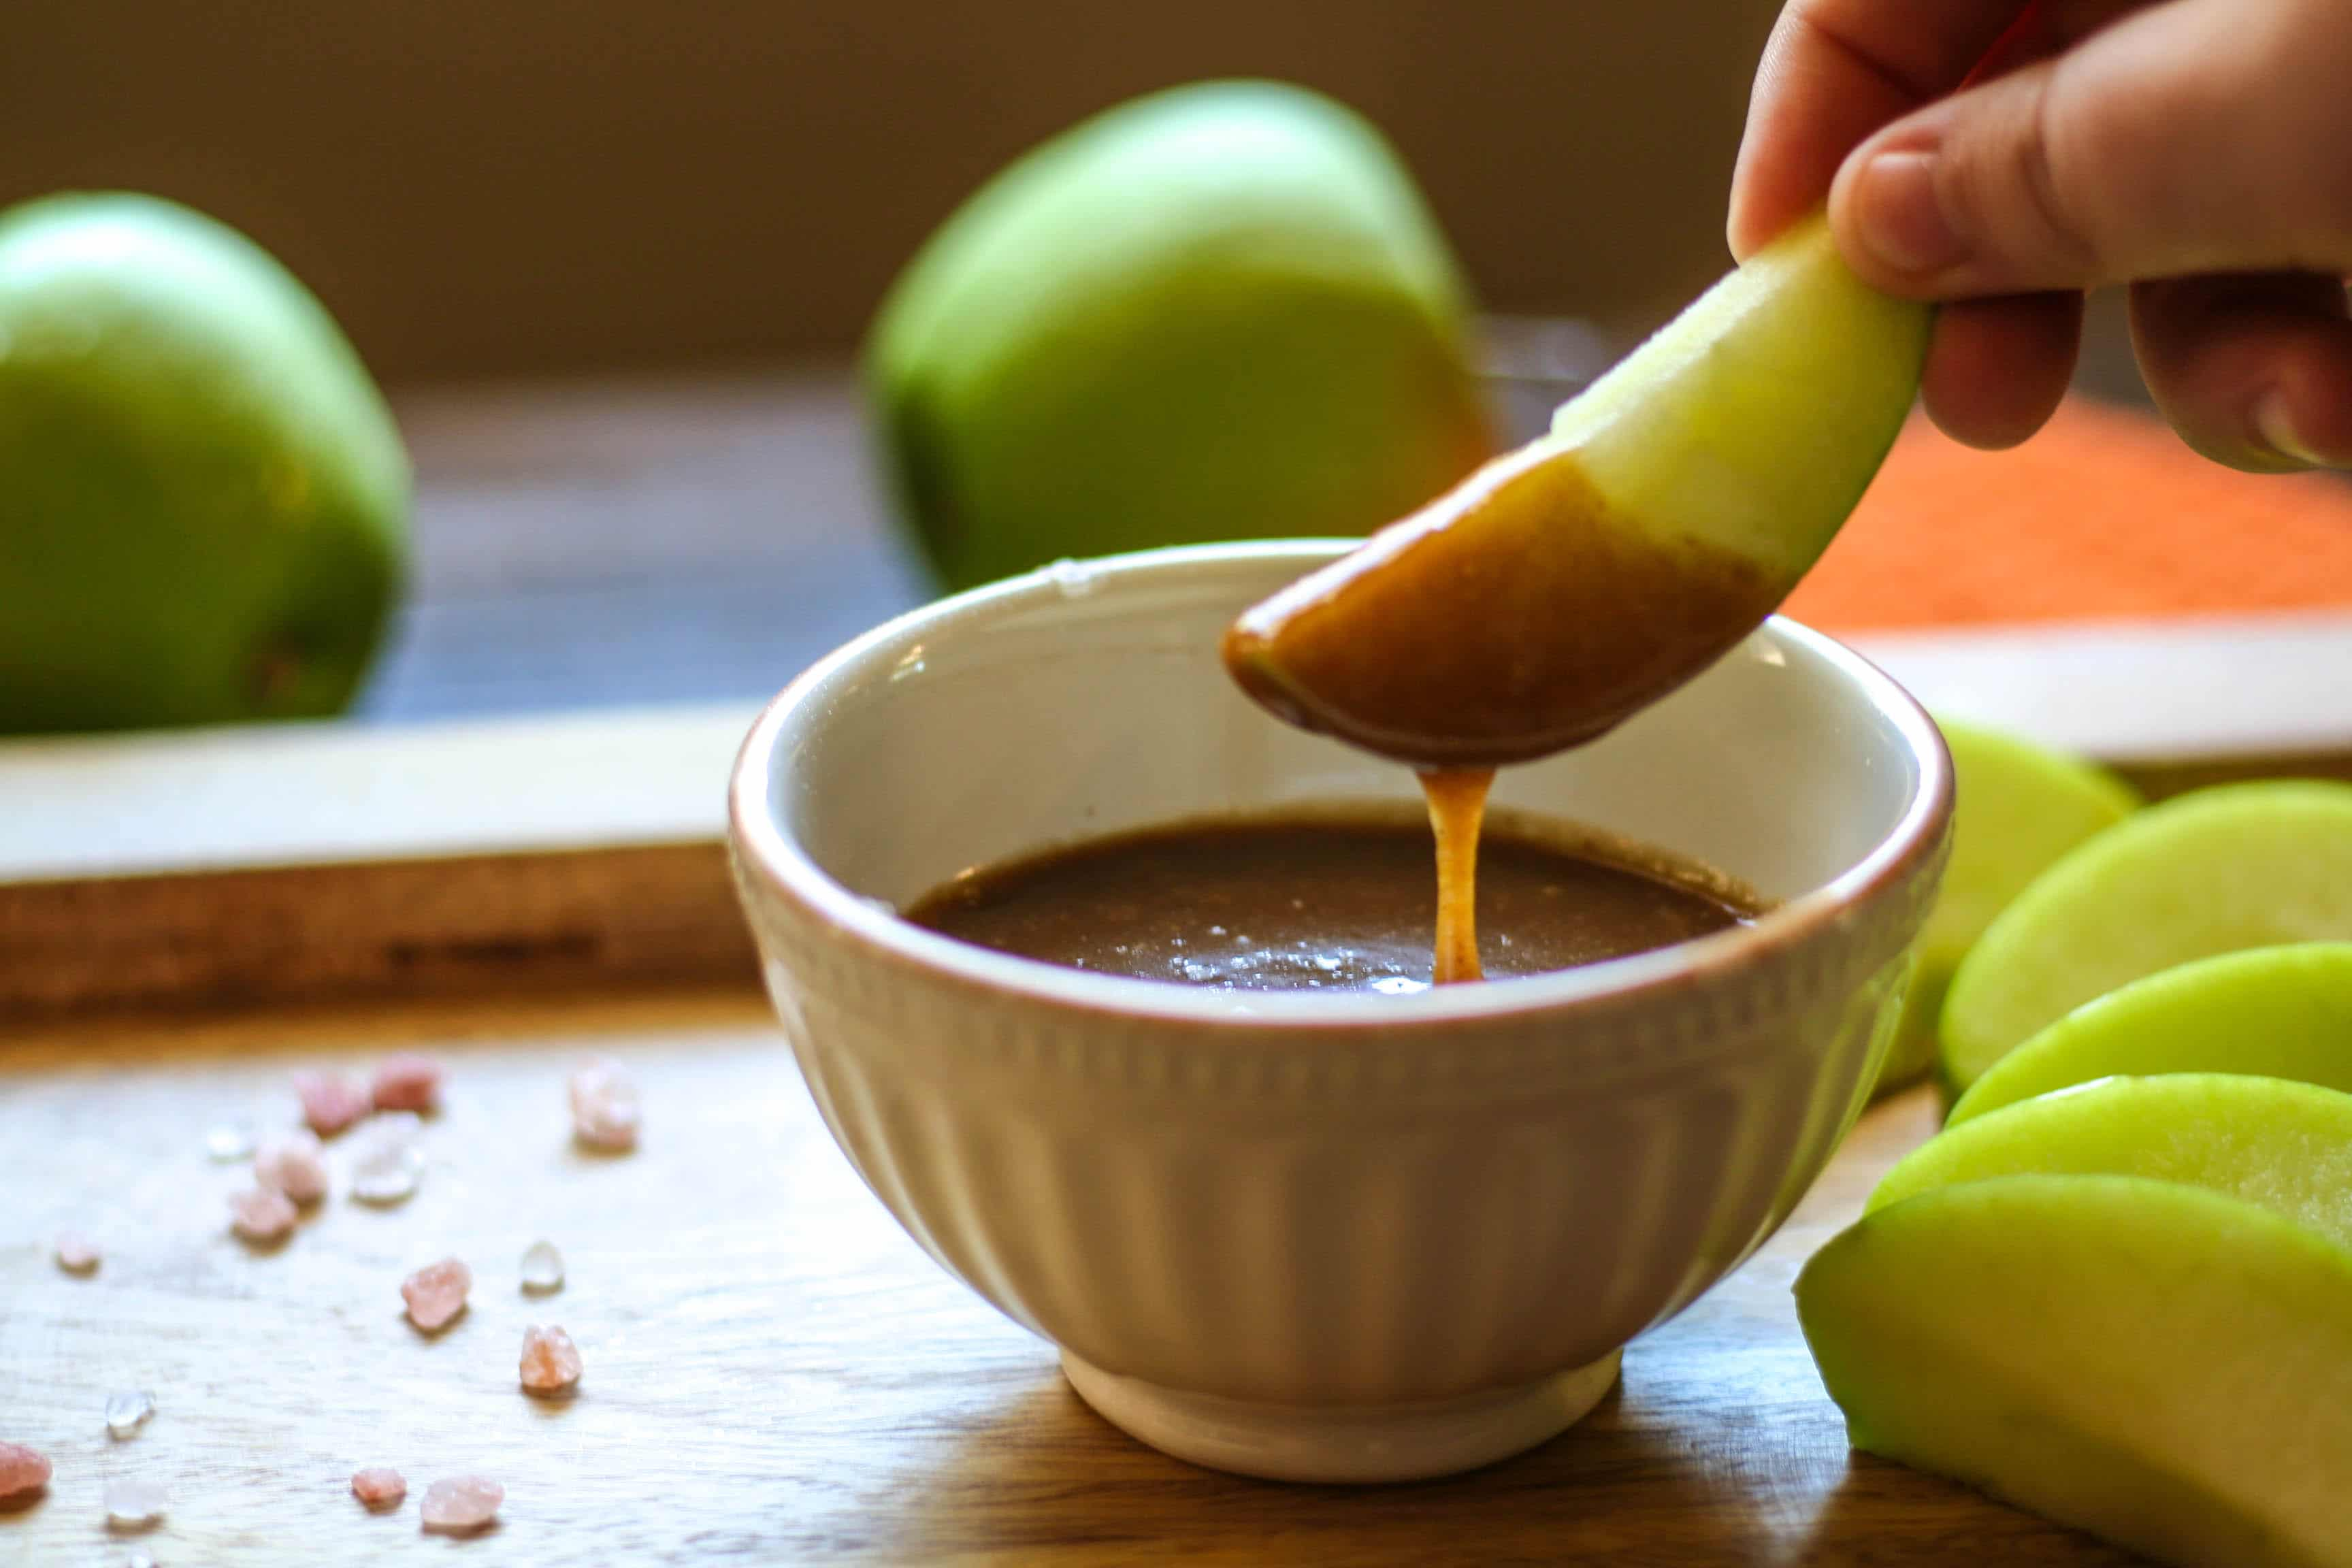 paleo-salted-caramel-dip